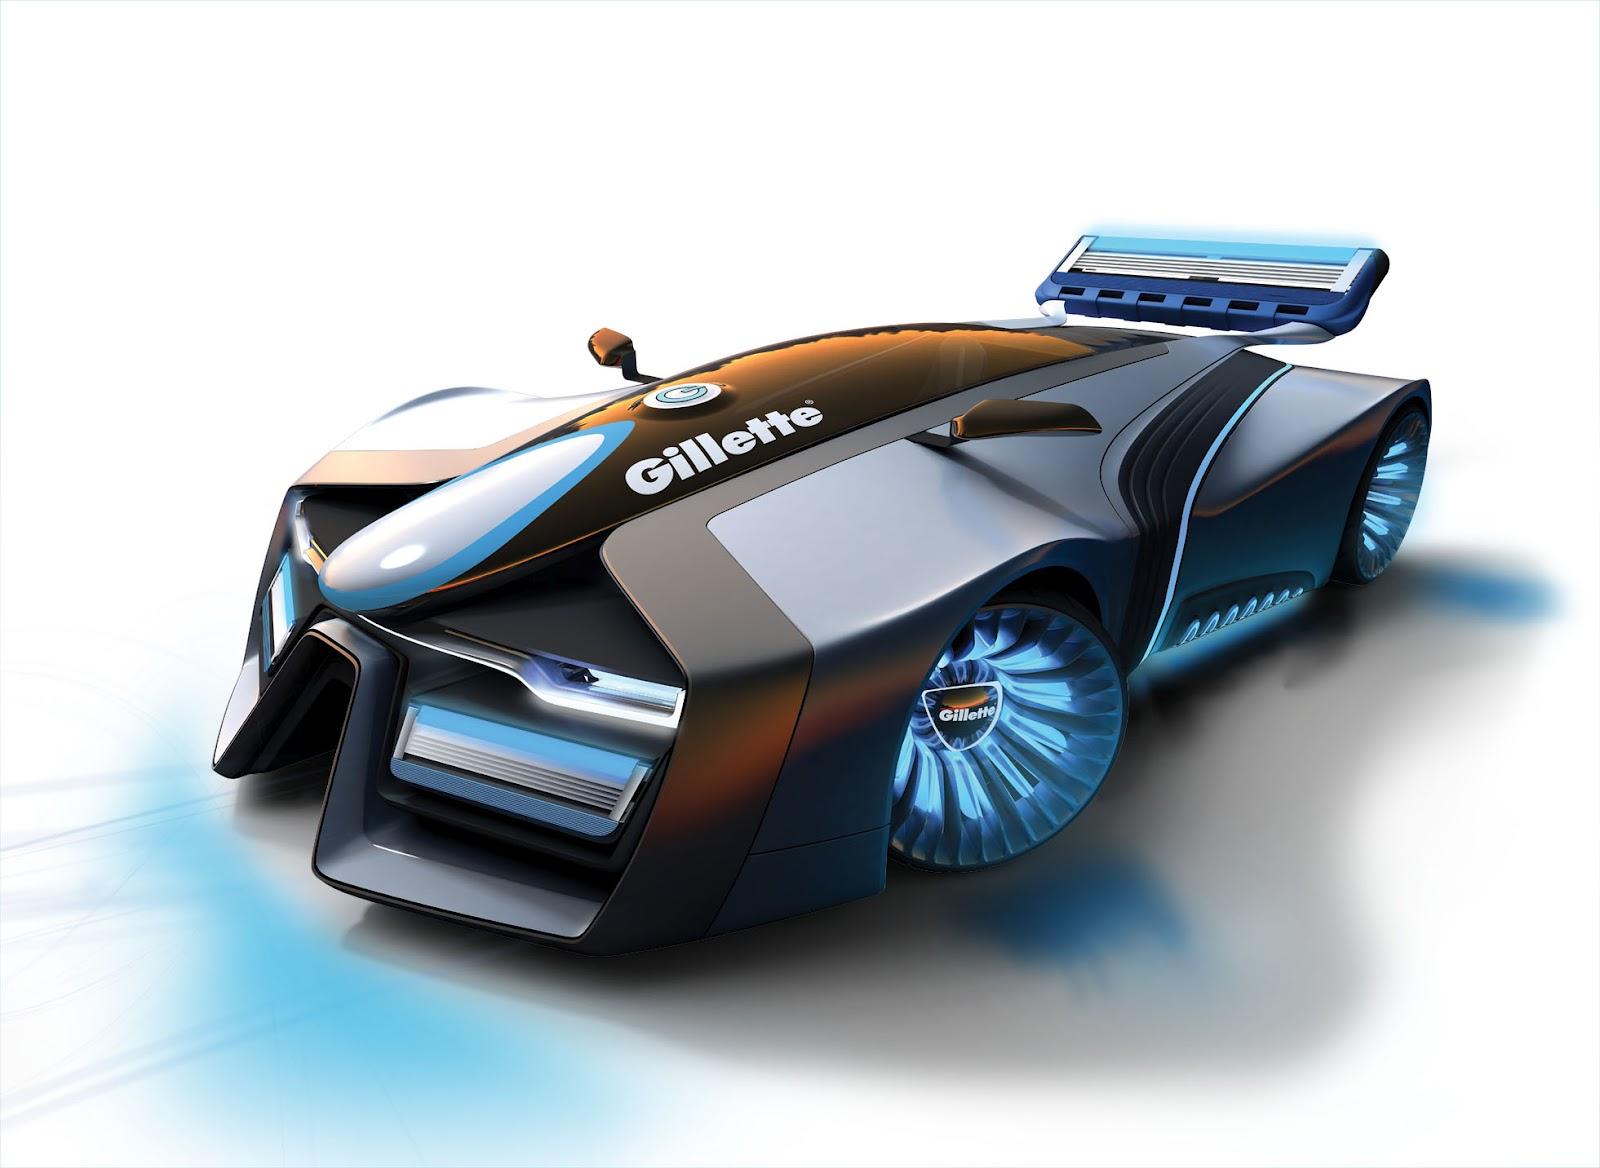 Design Your Own Car >> Design Your Own Car Get A Chance To Win An Amazing Dubai Autodrome